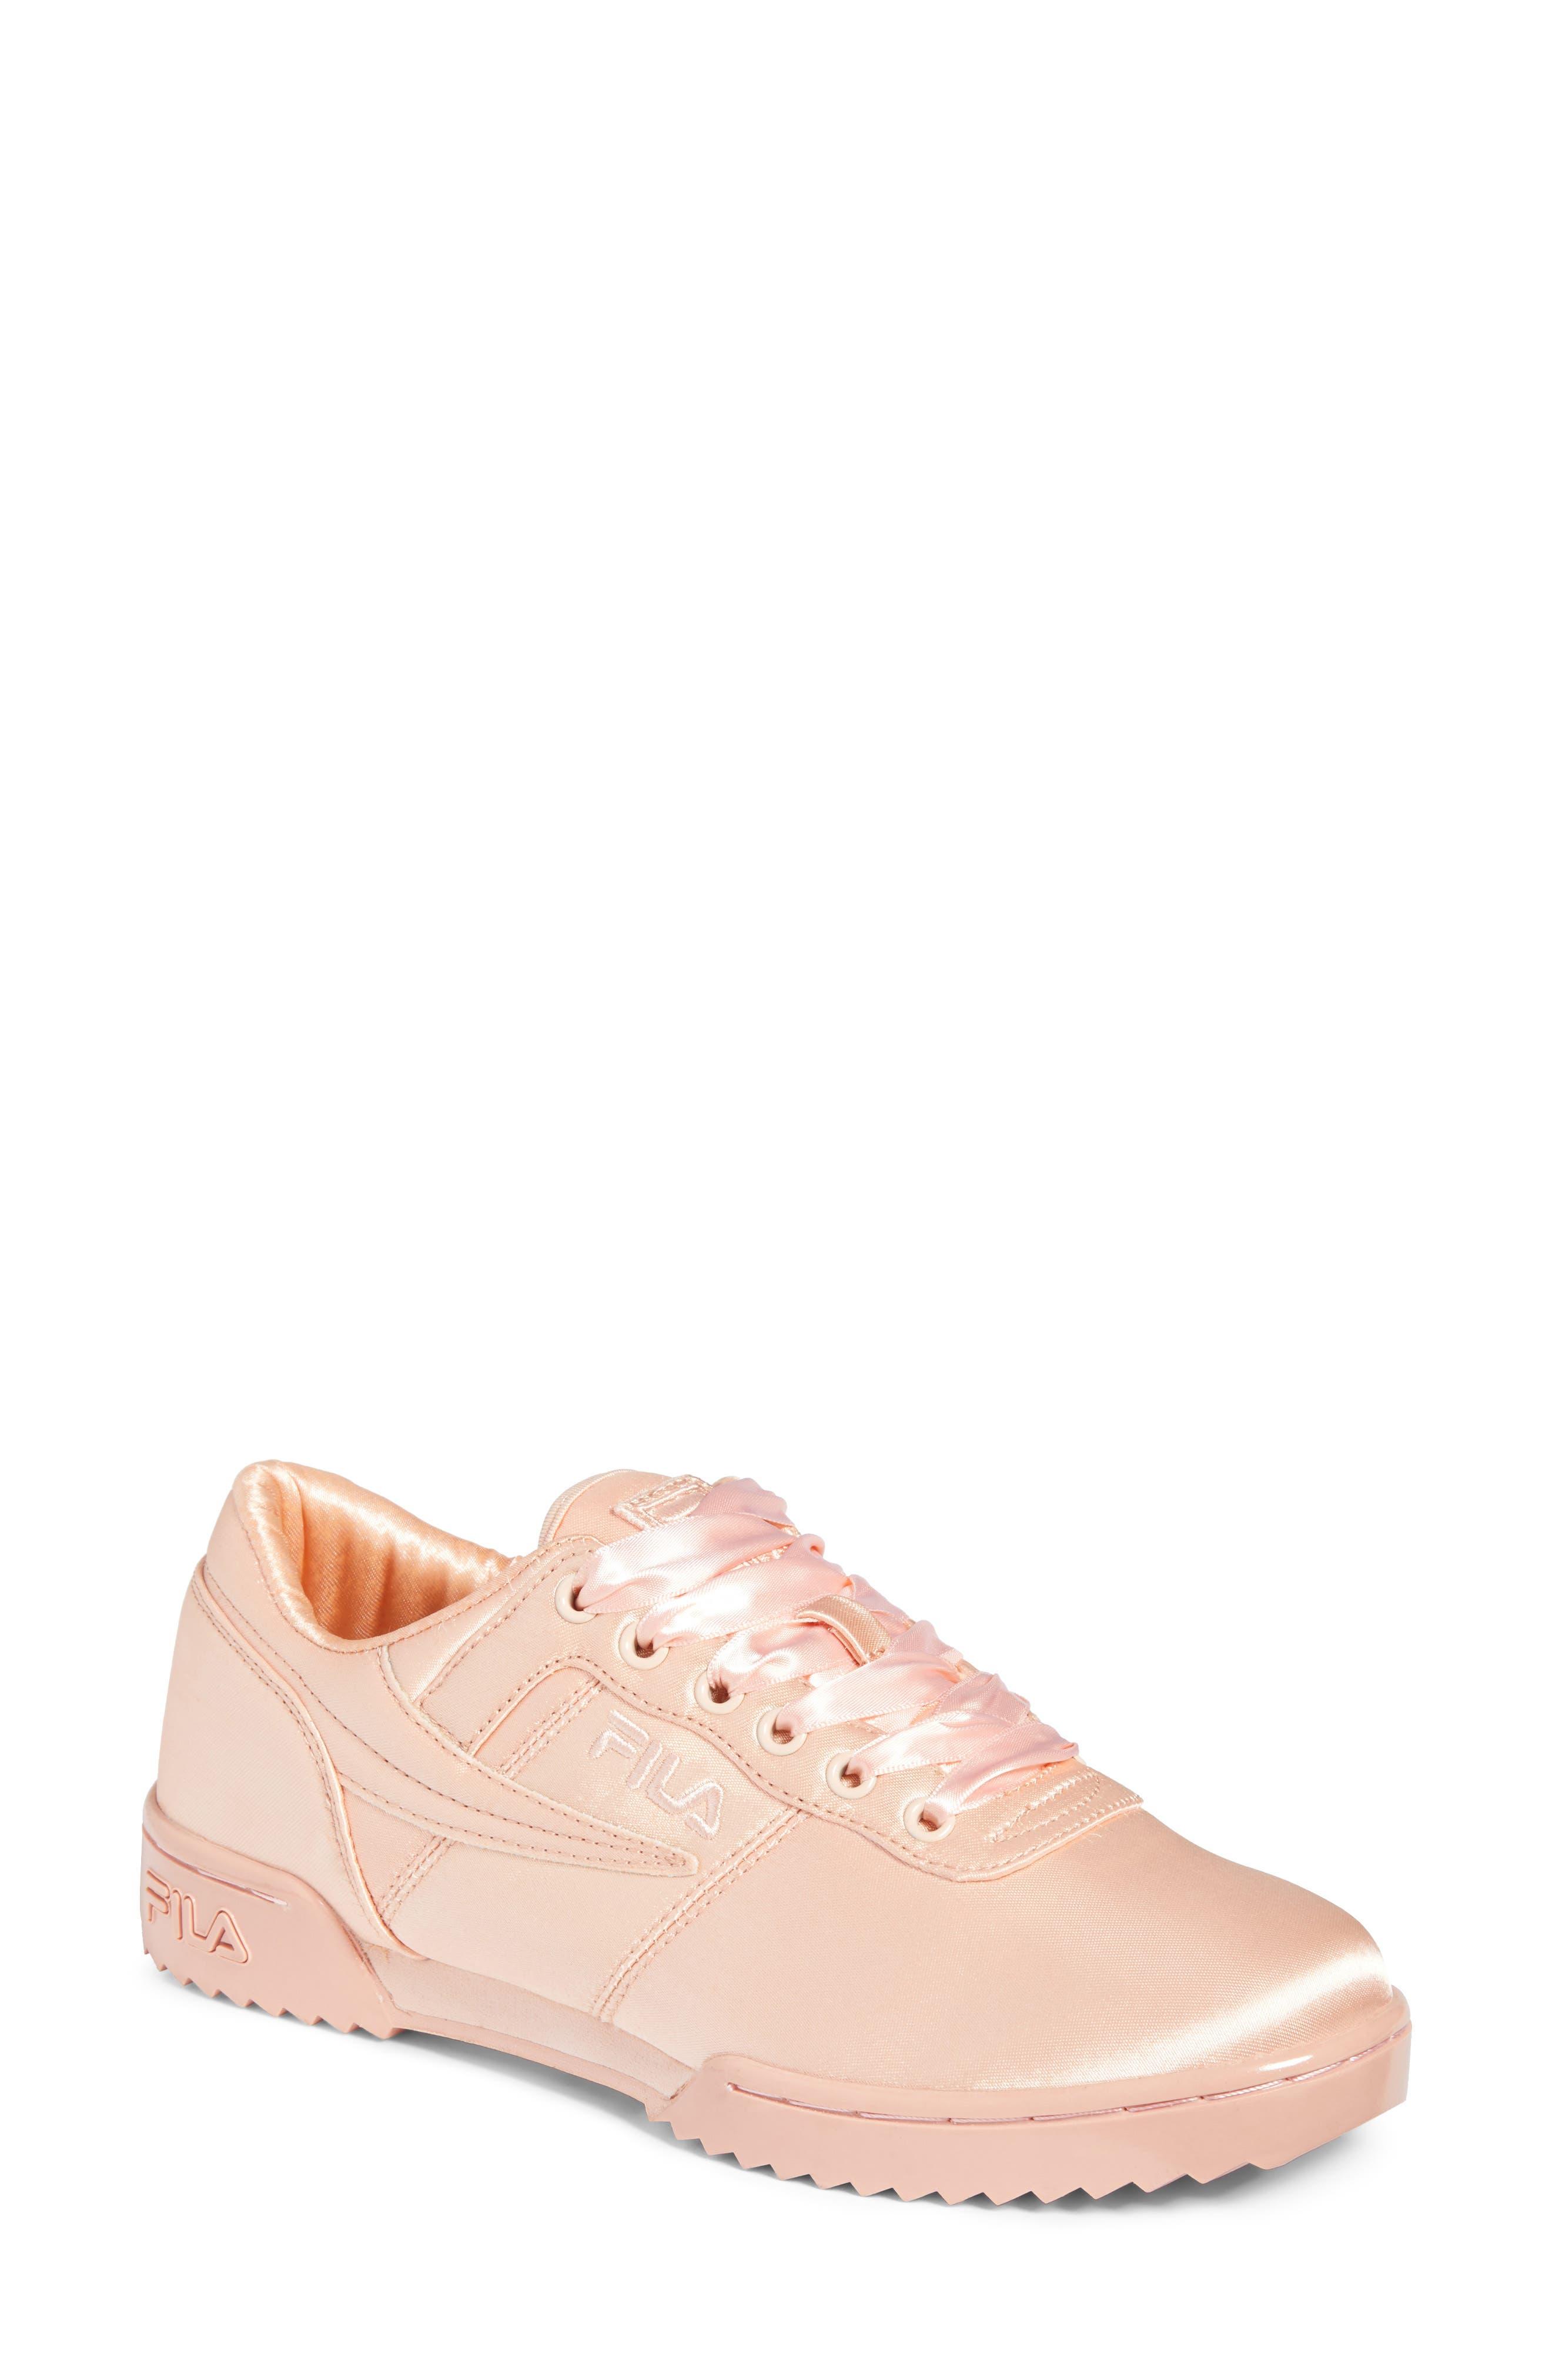 FILA Original Fitness Ripple Satin Sneaker (Women)